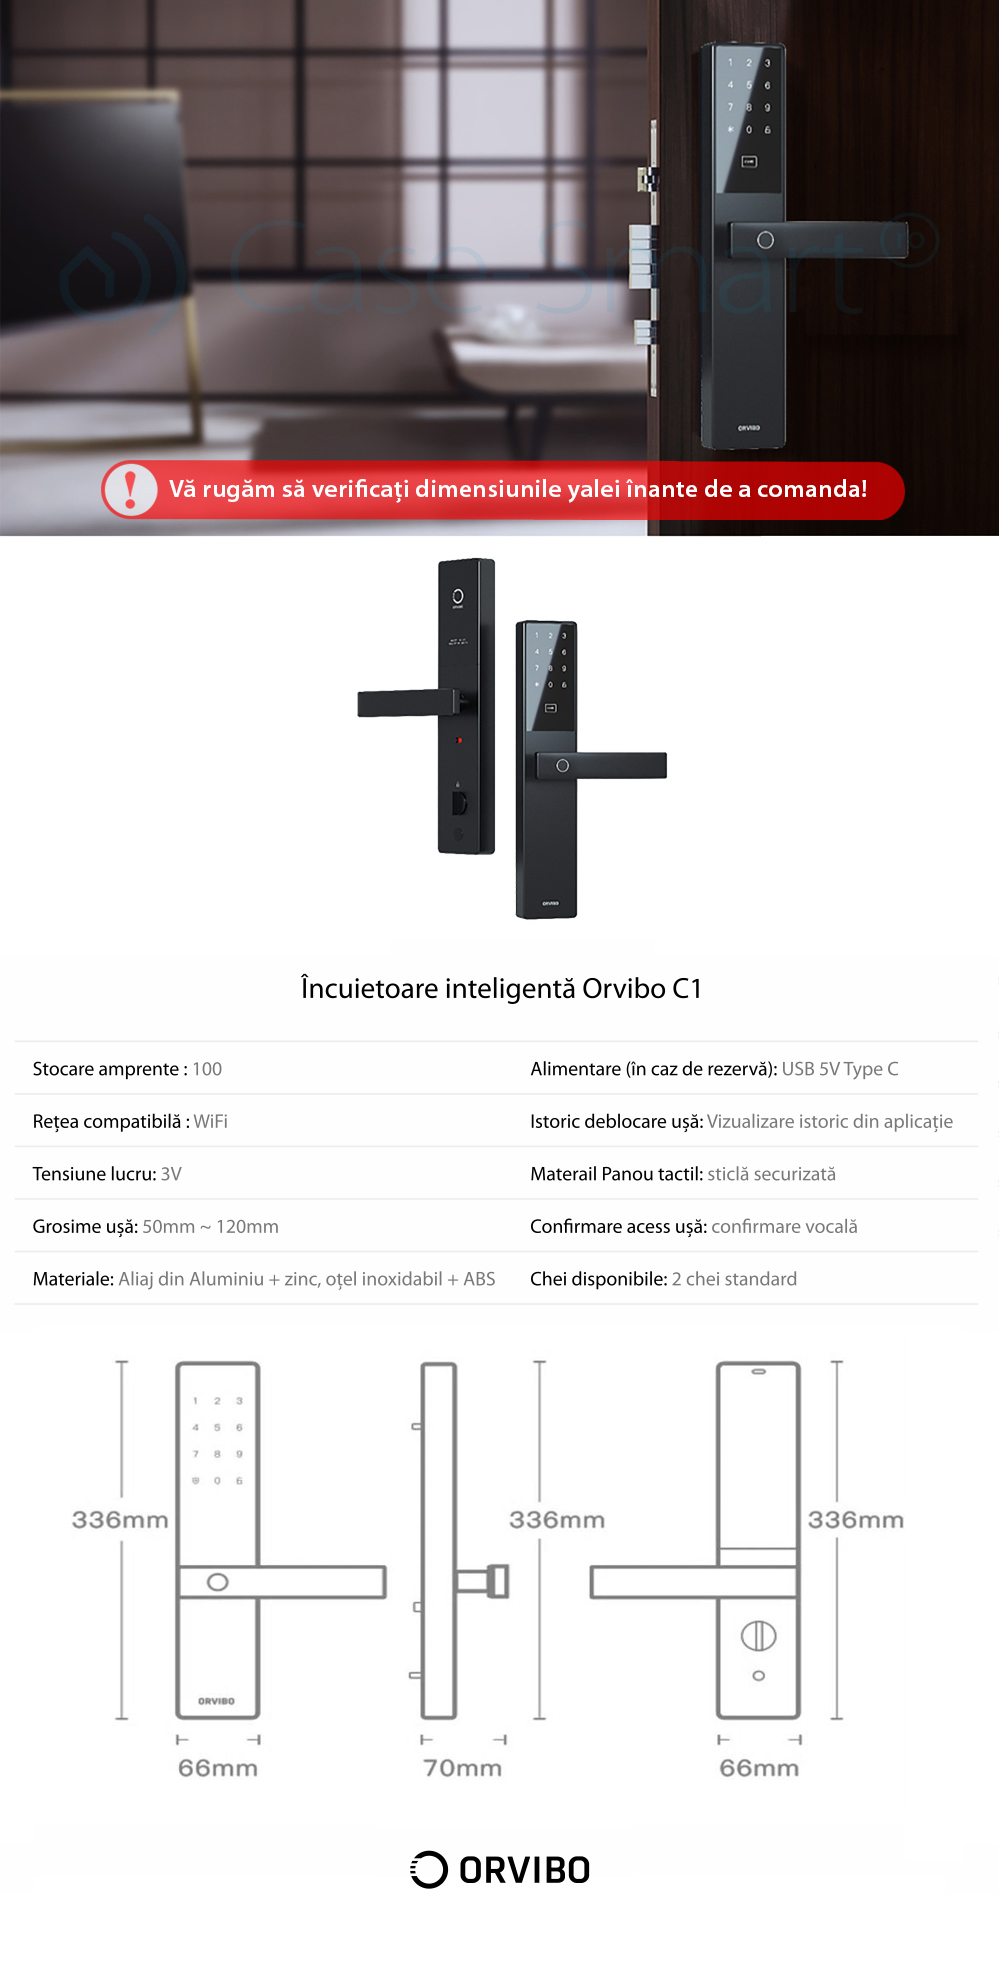 Incuietoare inteligenta Orvibo C1, Monitorizare in timp real, Control de pe telefonul mobil, Amprenta, Parola, Istoric